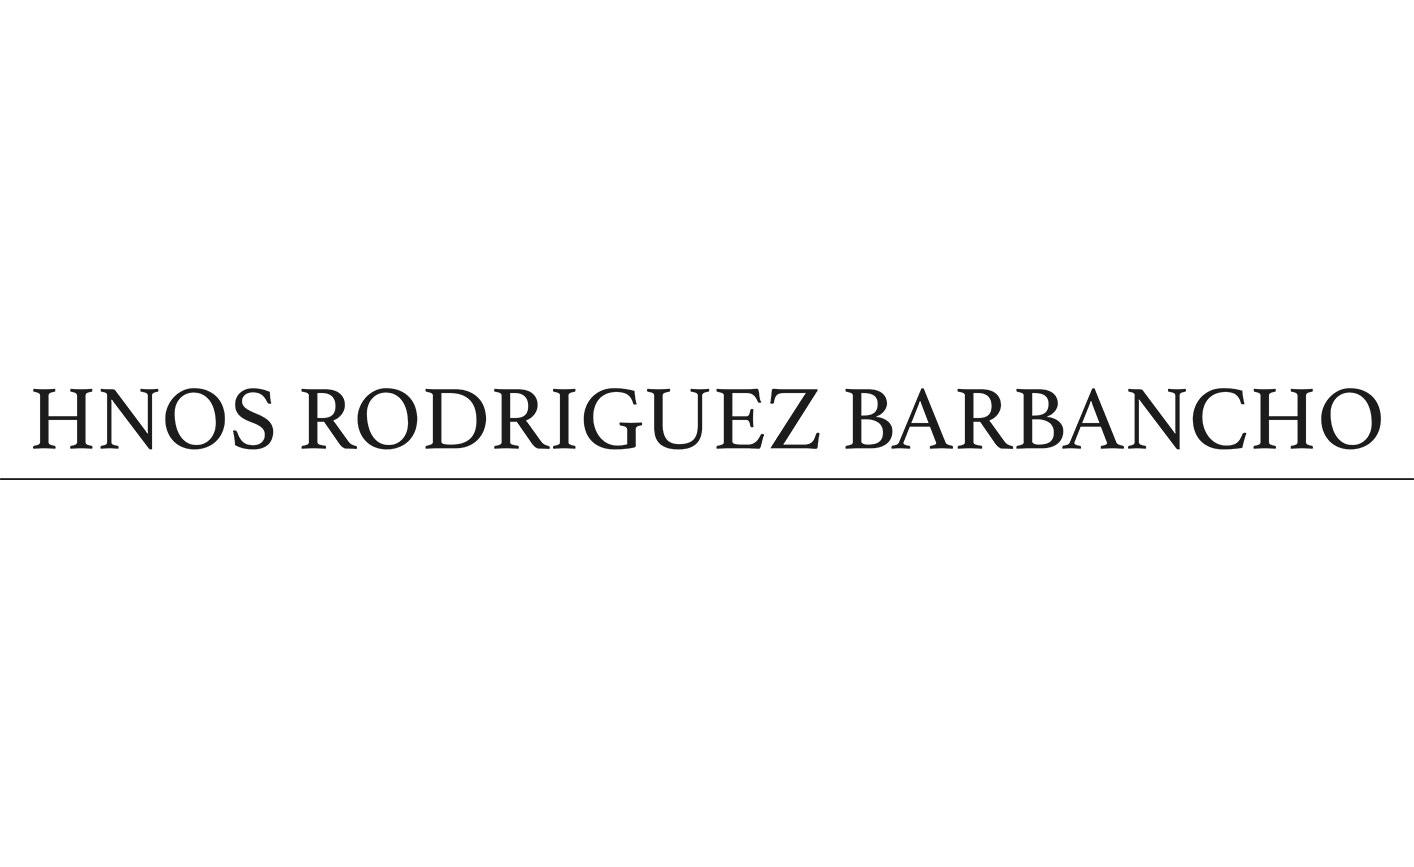 Rodriguez Barbancho - Dobuss